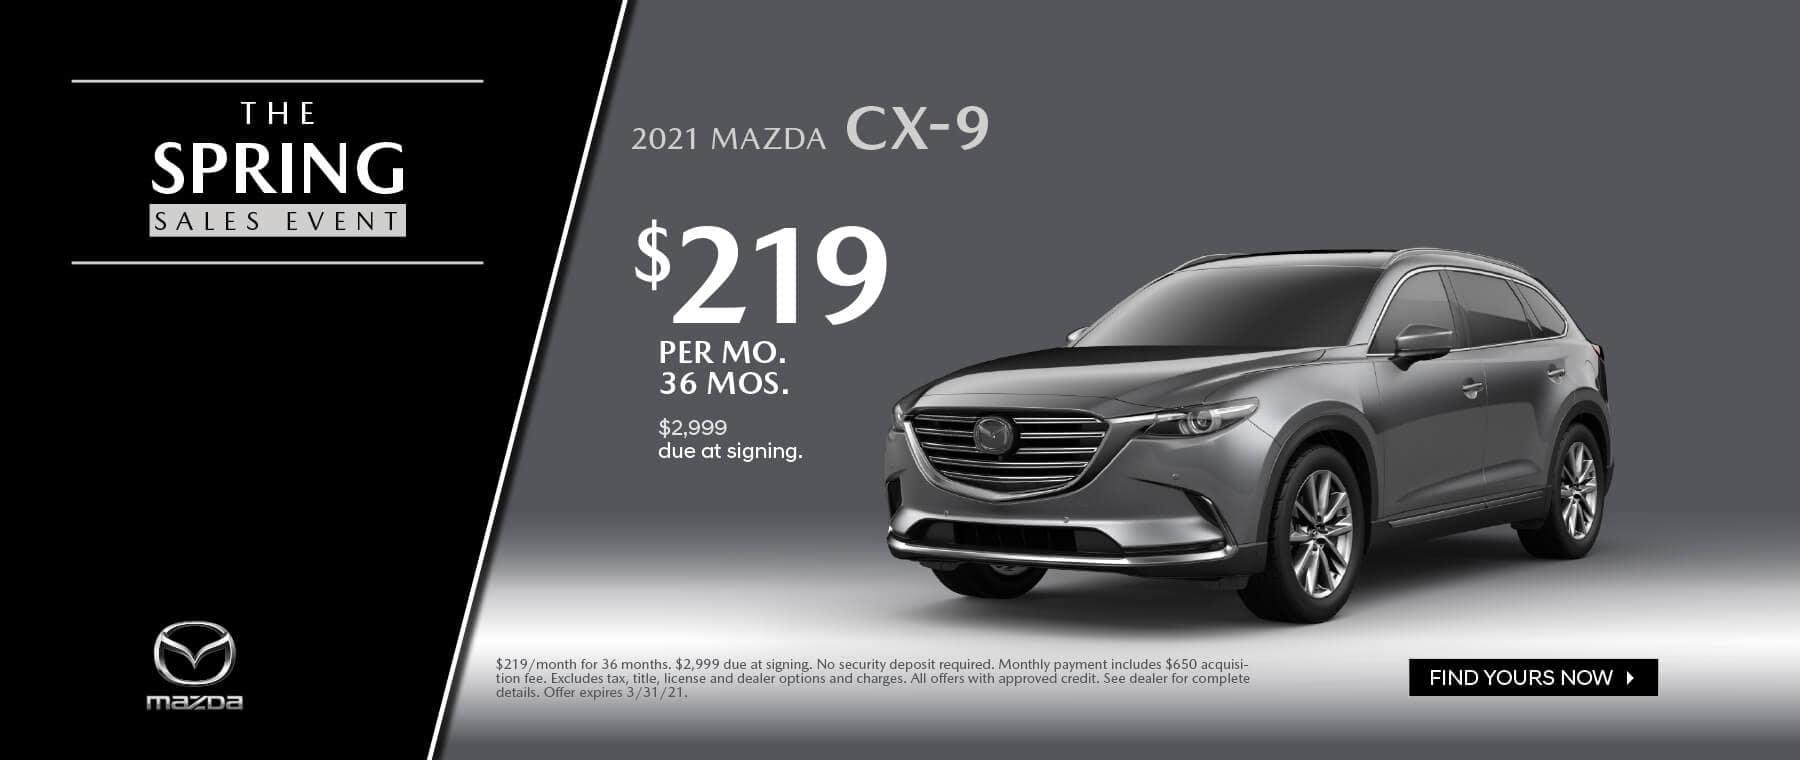 2021.02.24-Keffer-Mazda-MAR-Web-Banners-S51082vw-4